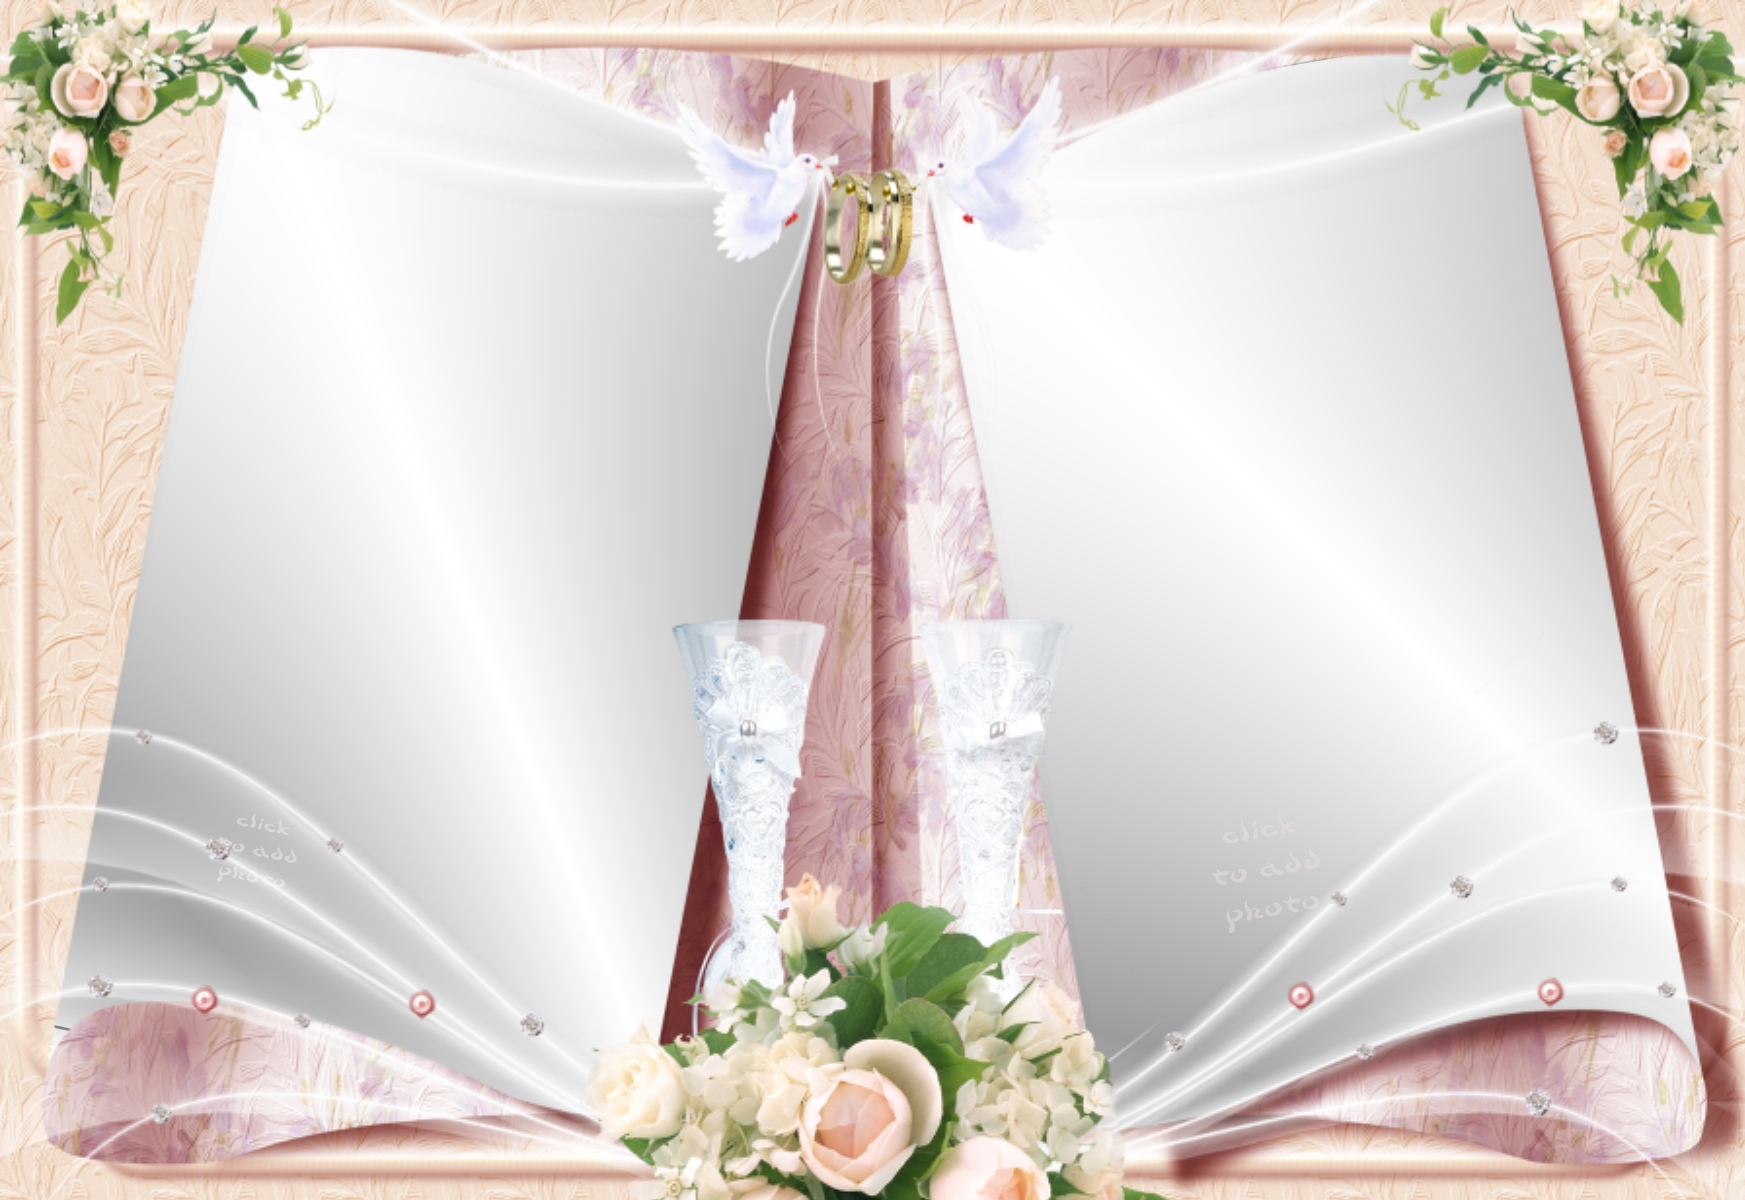 Imikimi Zo - Wedding Frames - 2009 November - Wedding Pictures ...